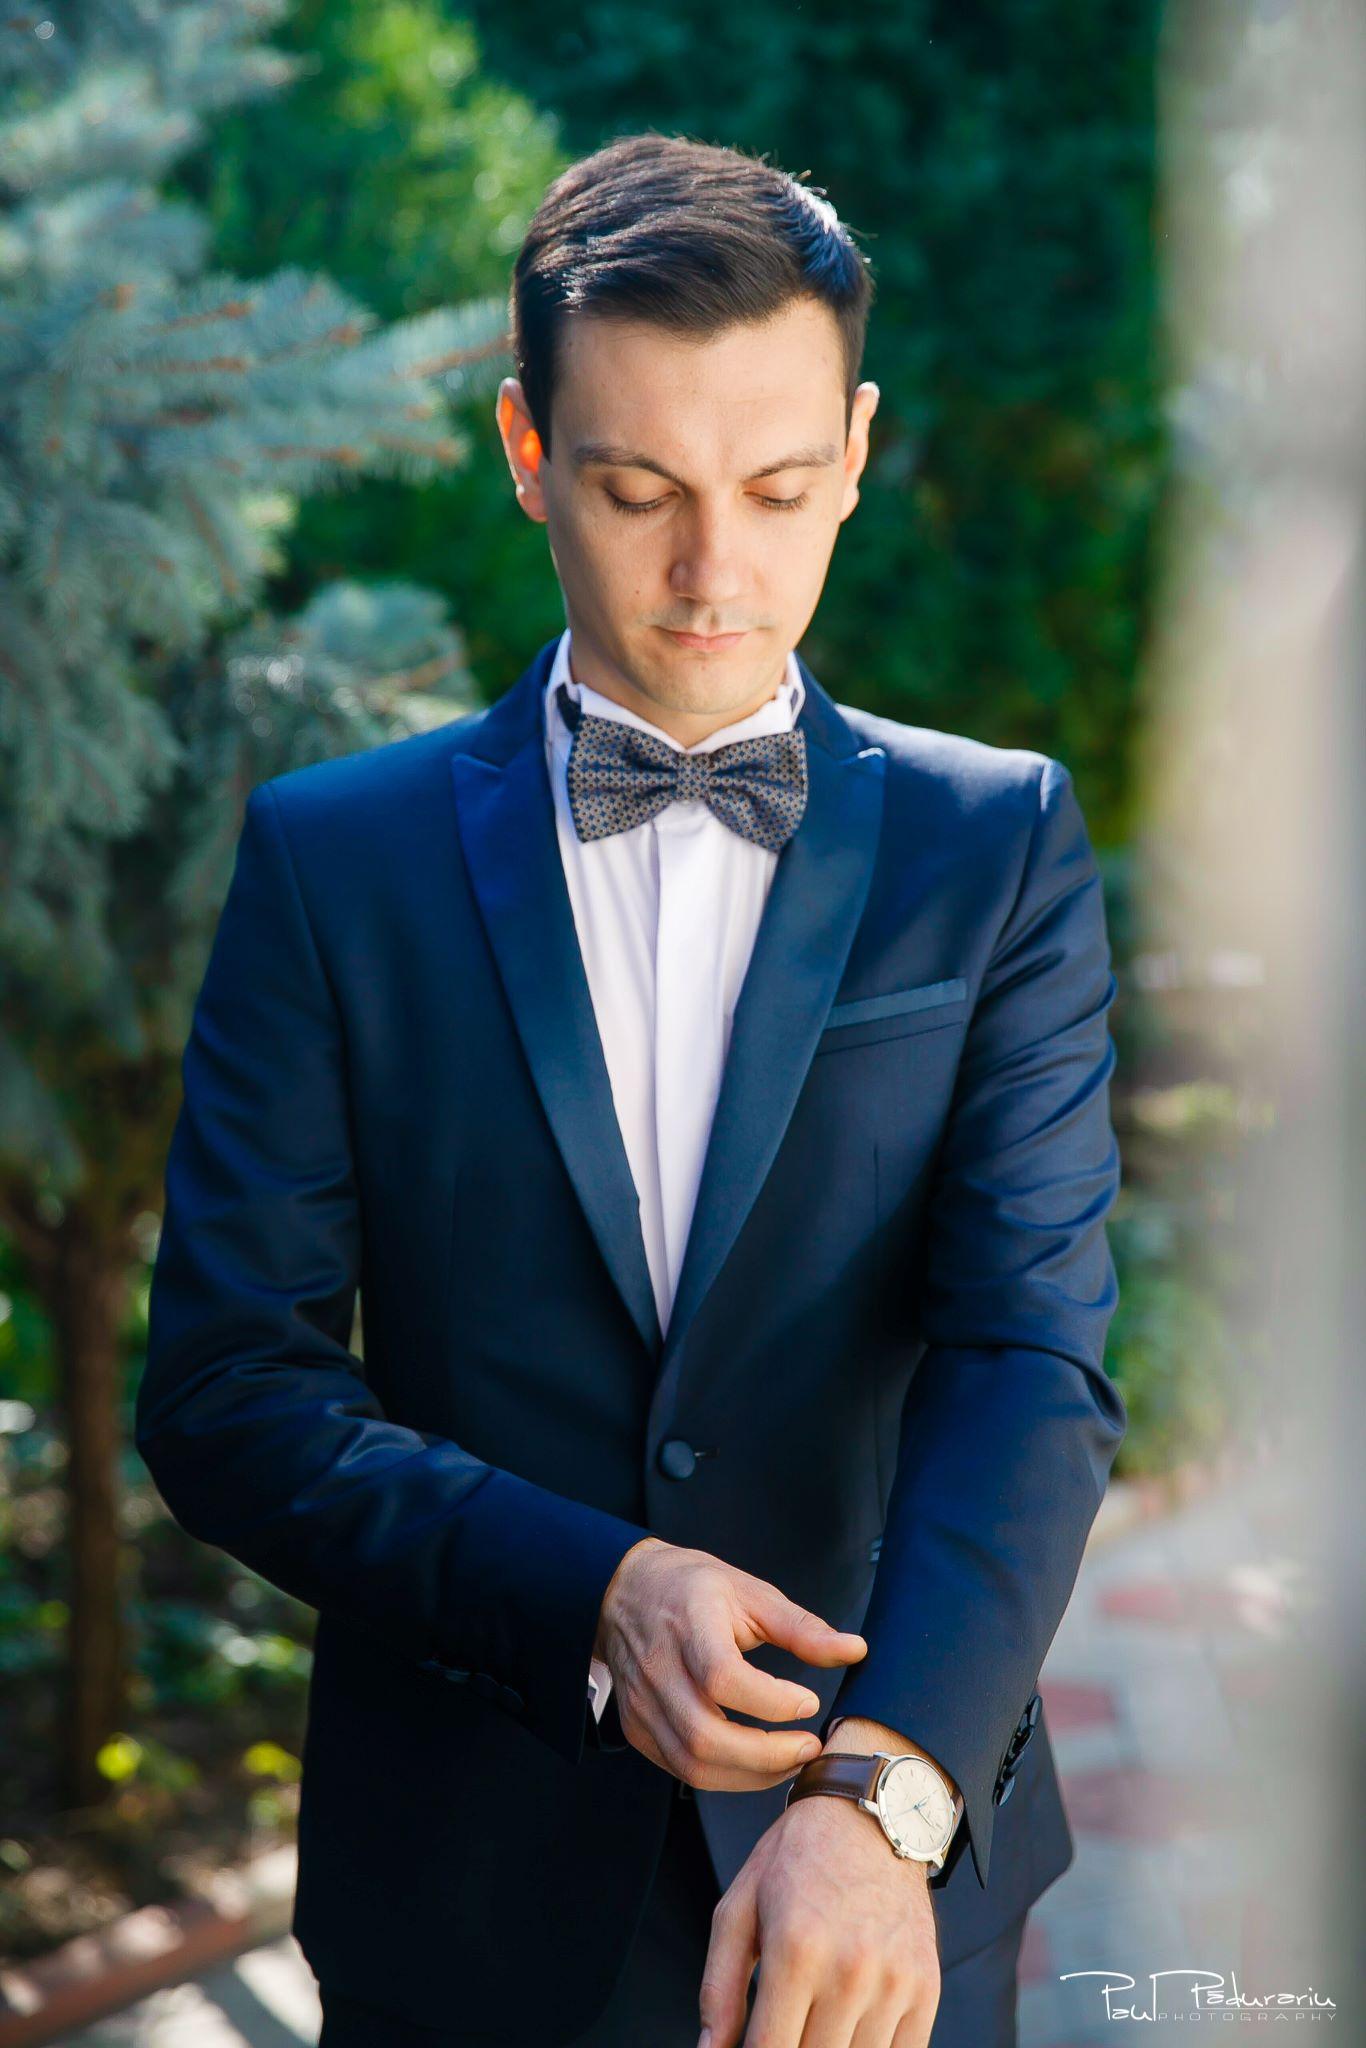 Nicoleta si Catalin nunta Iasi fotograf profesionist Paul Padurariu 2018 3